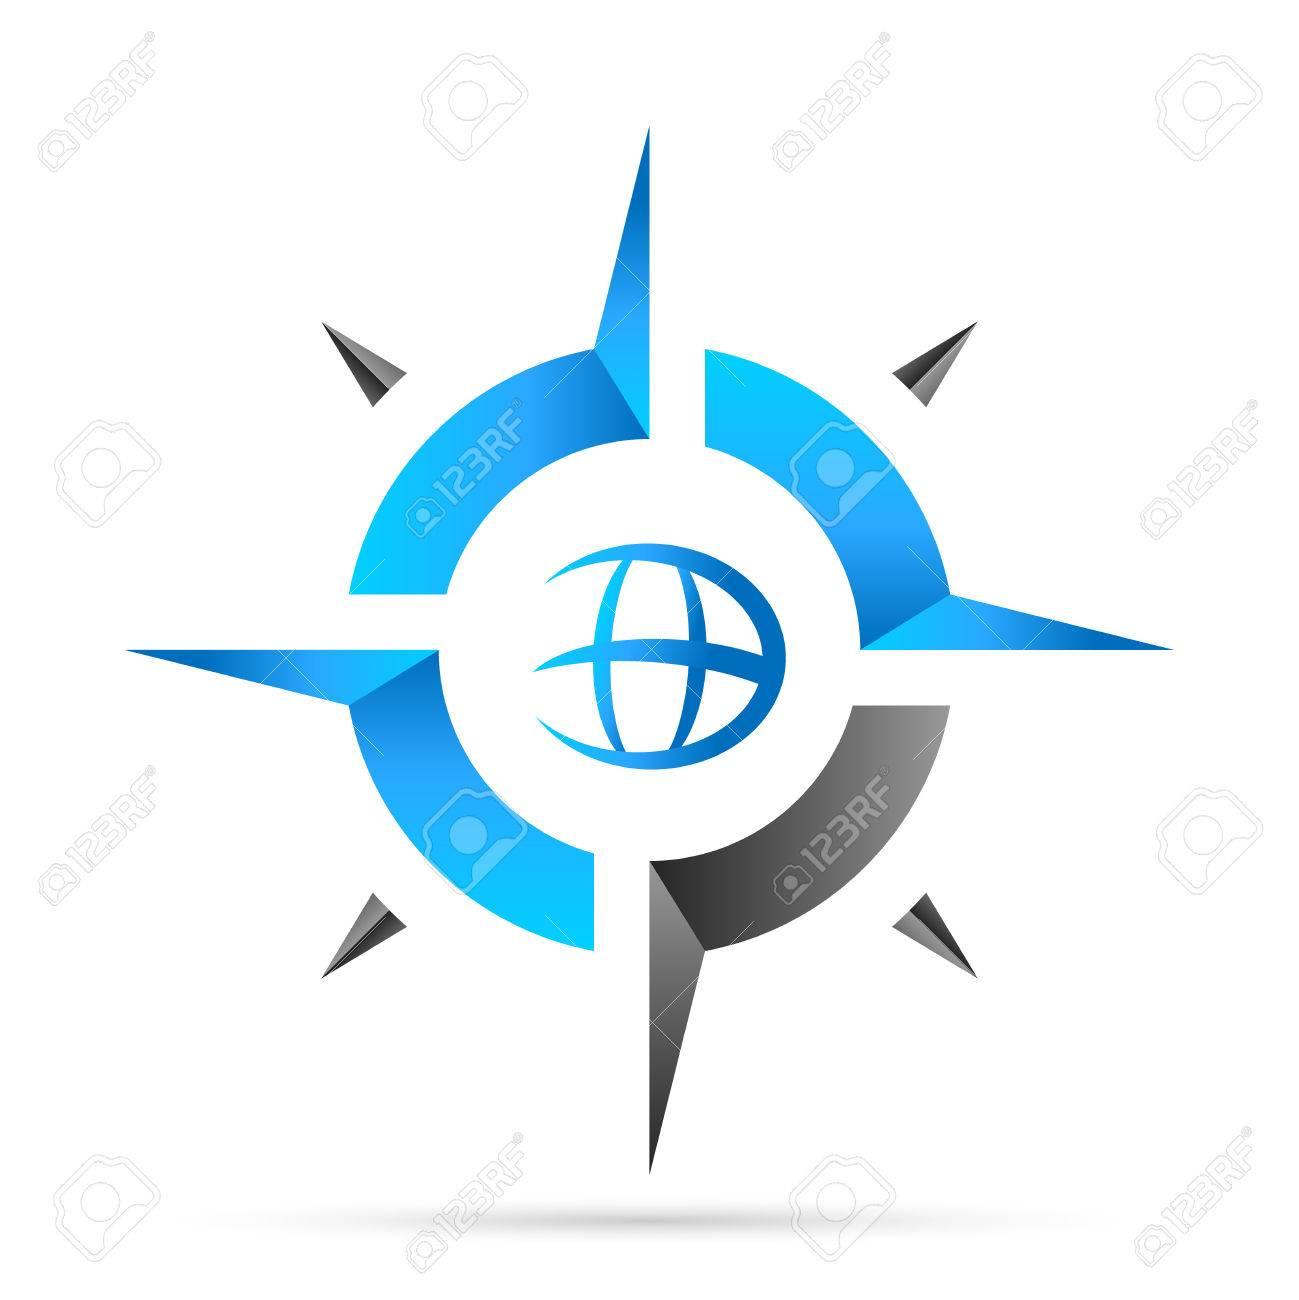 compass, navigation icon - 51292144